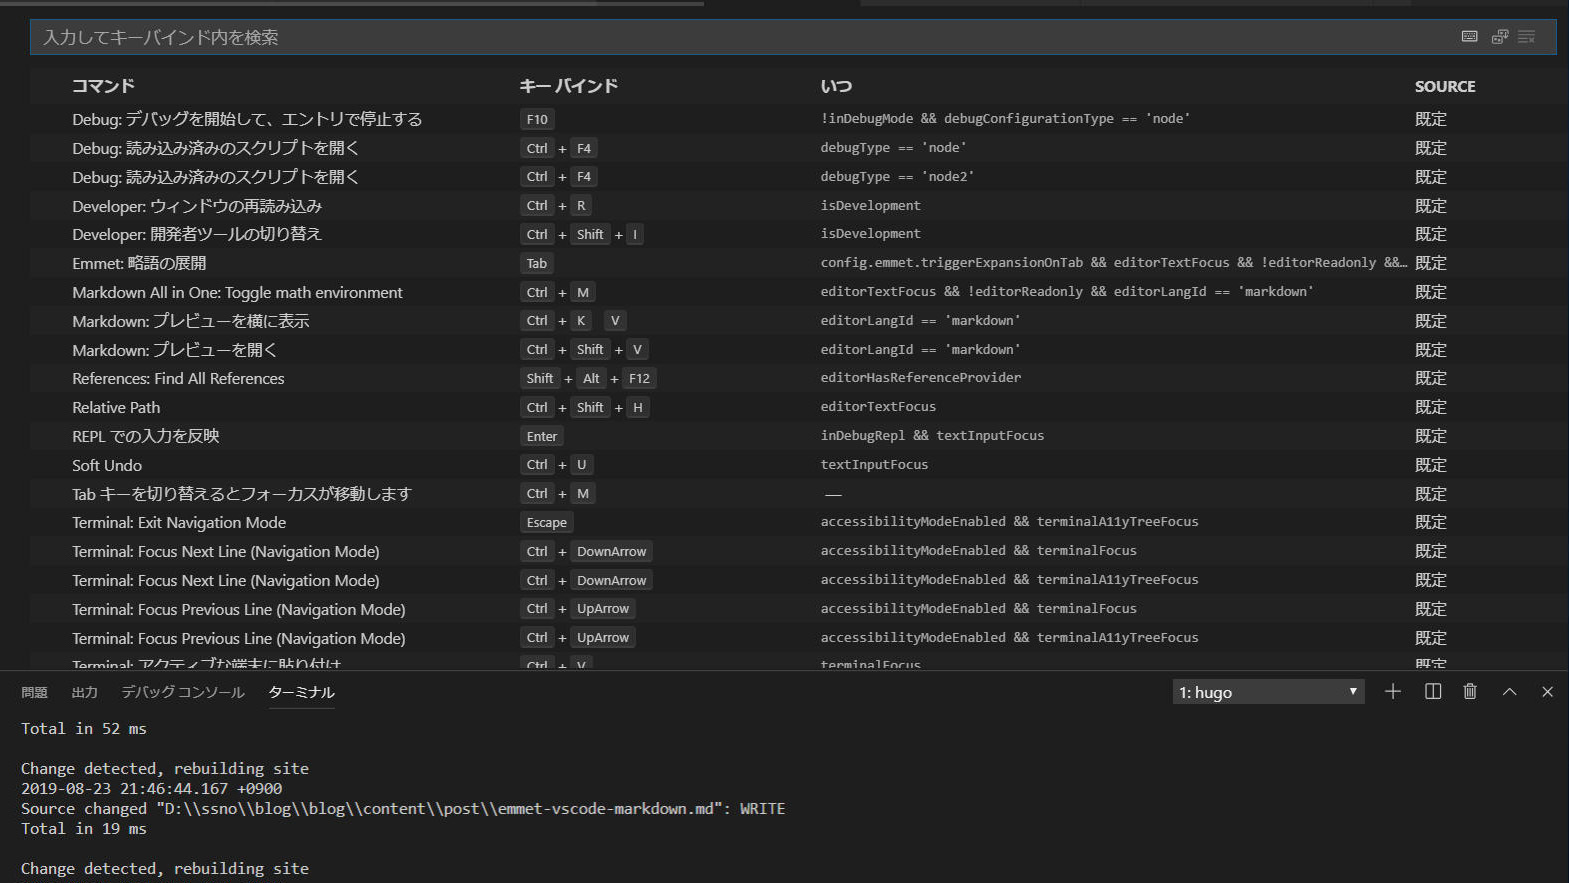 VSCodeでショートカットキーを検索する